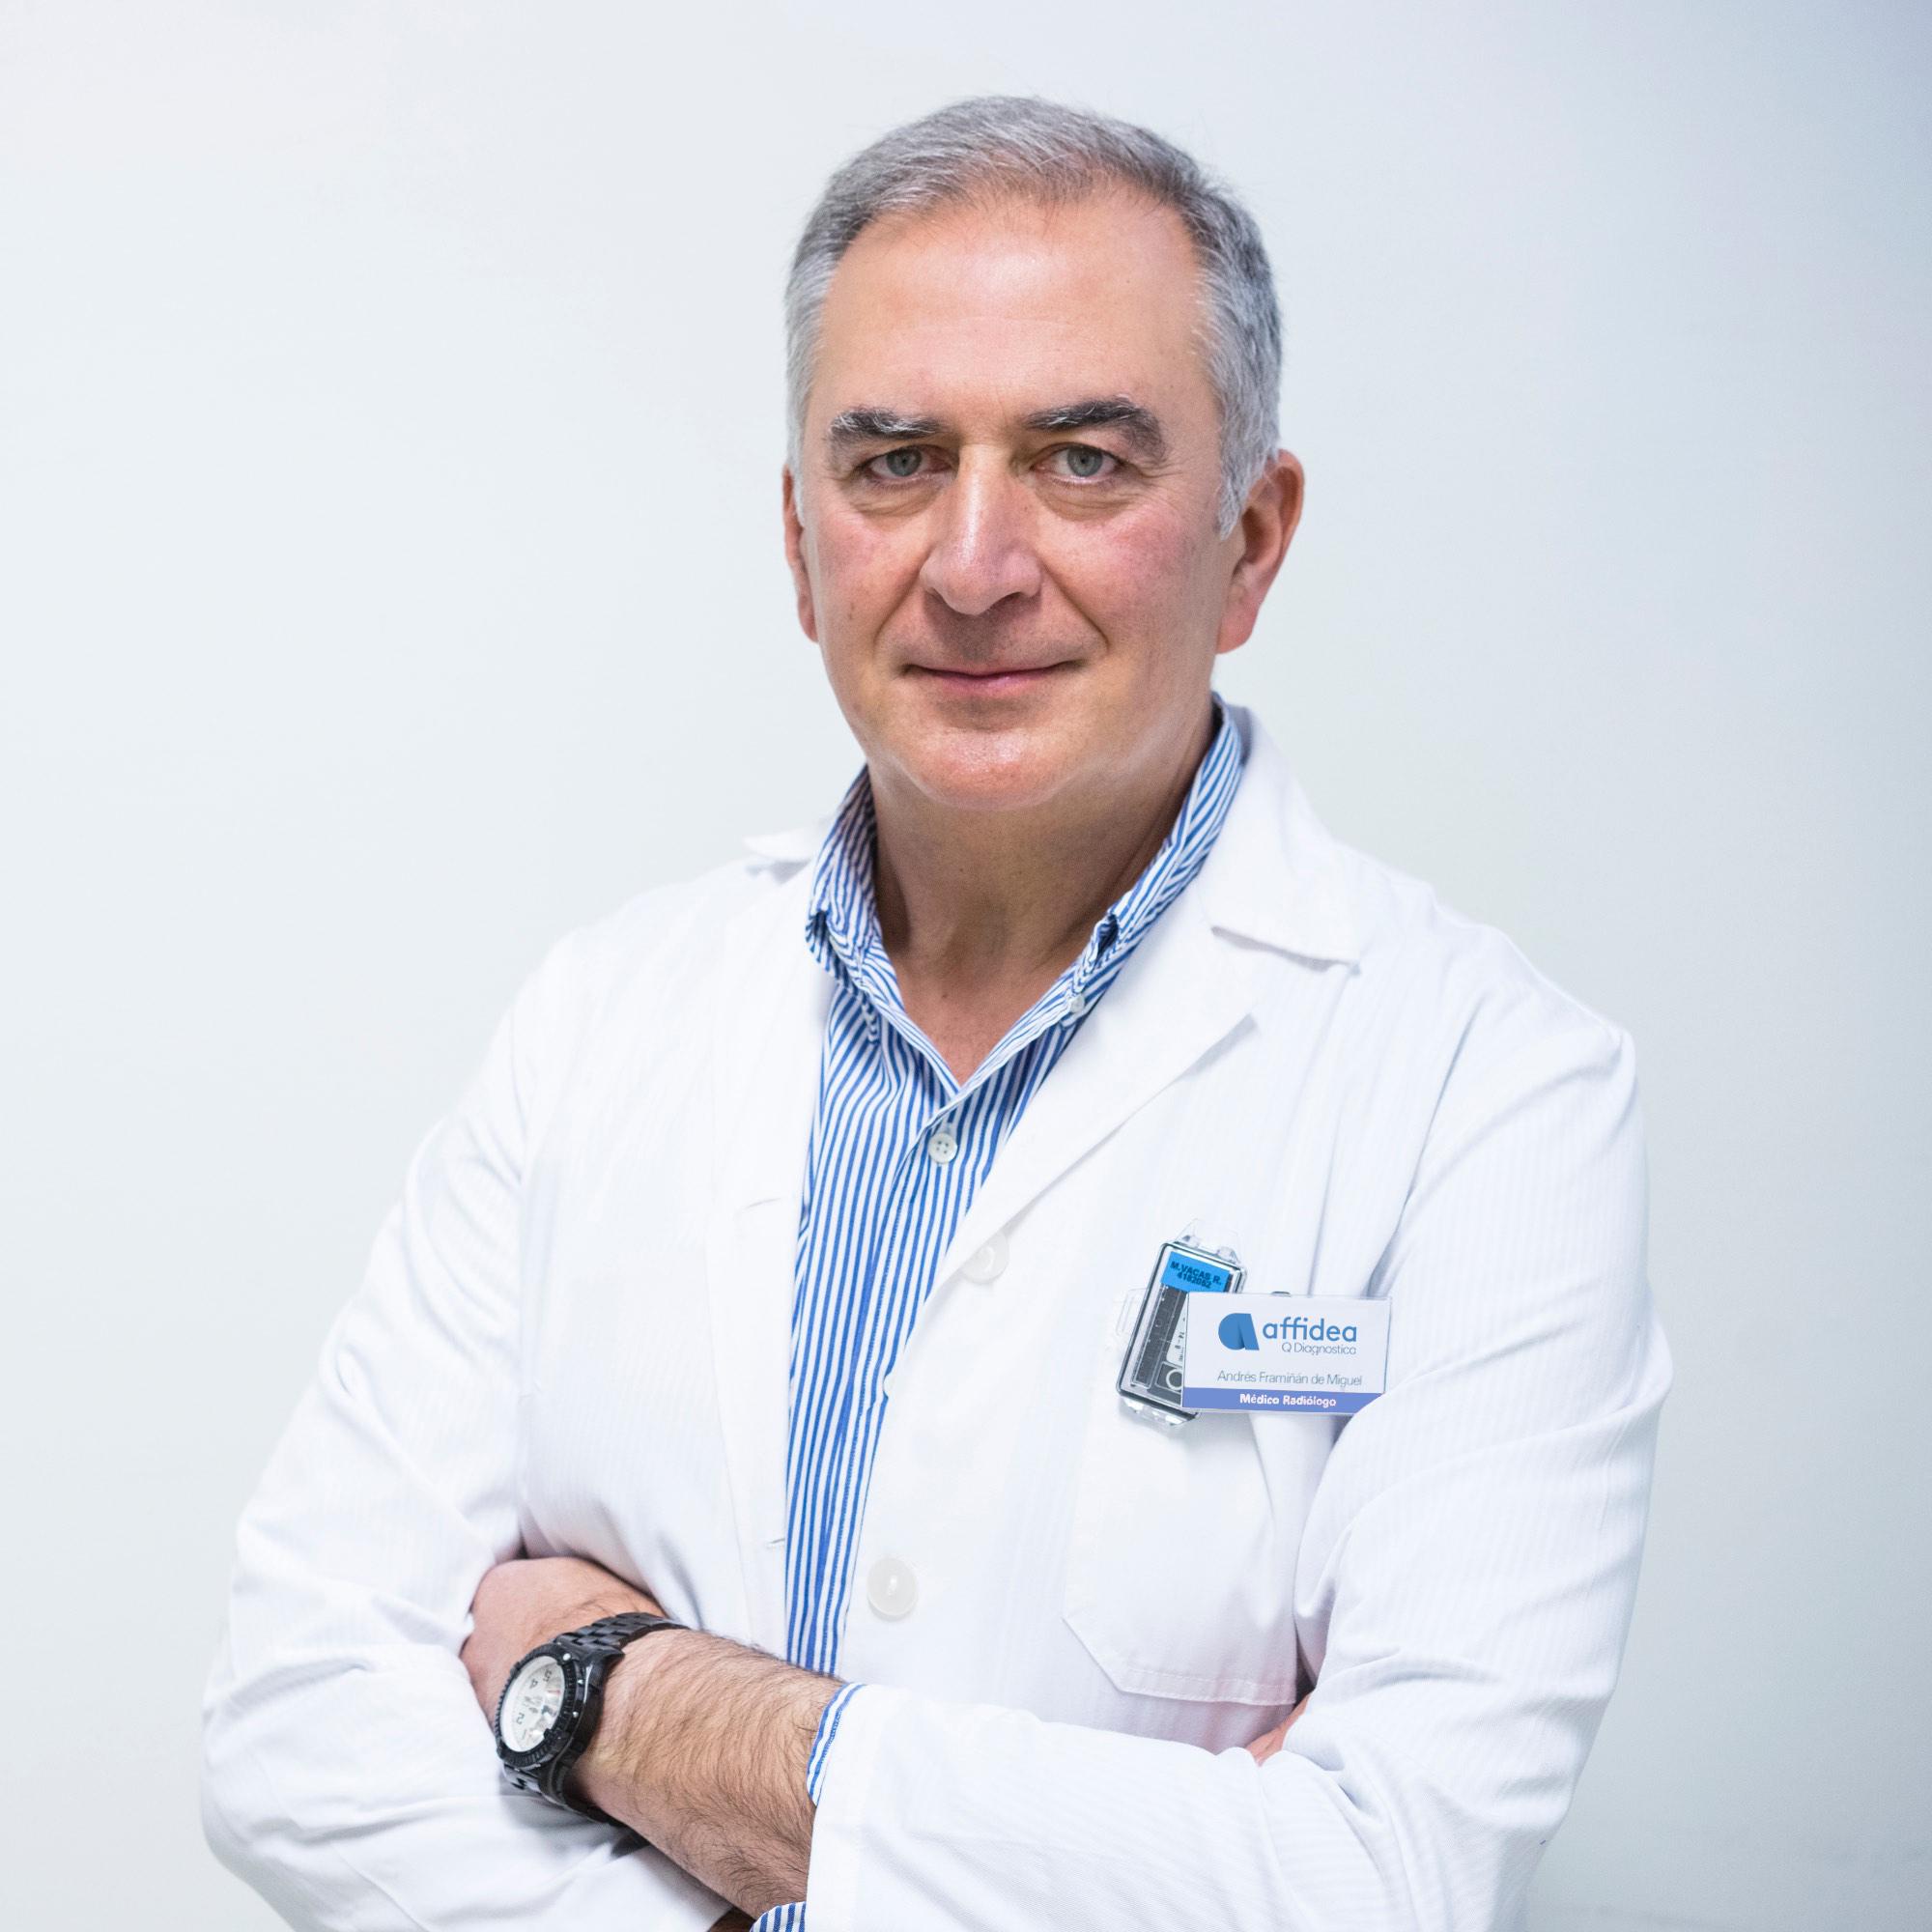 Meet Dr. Andrés Framiñan